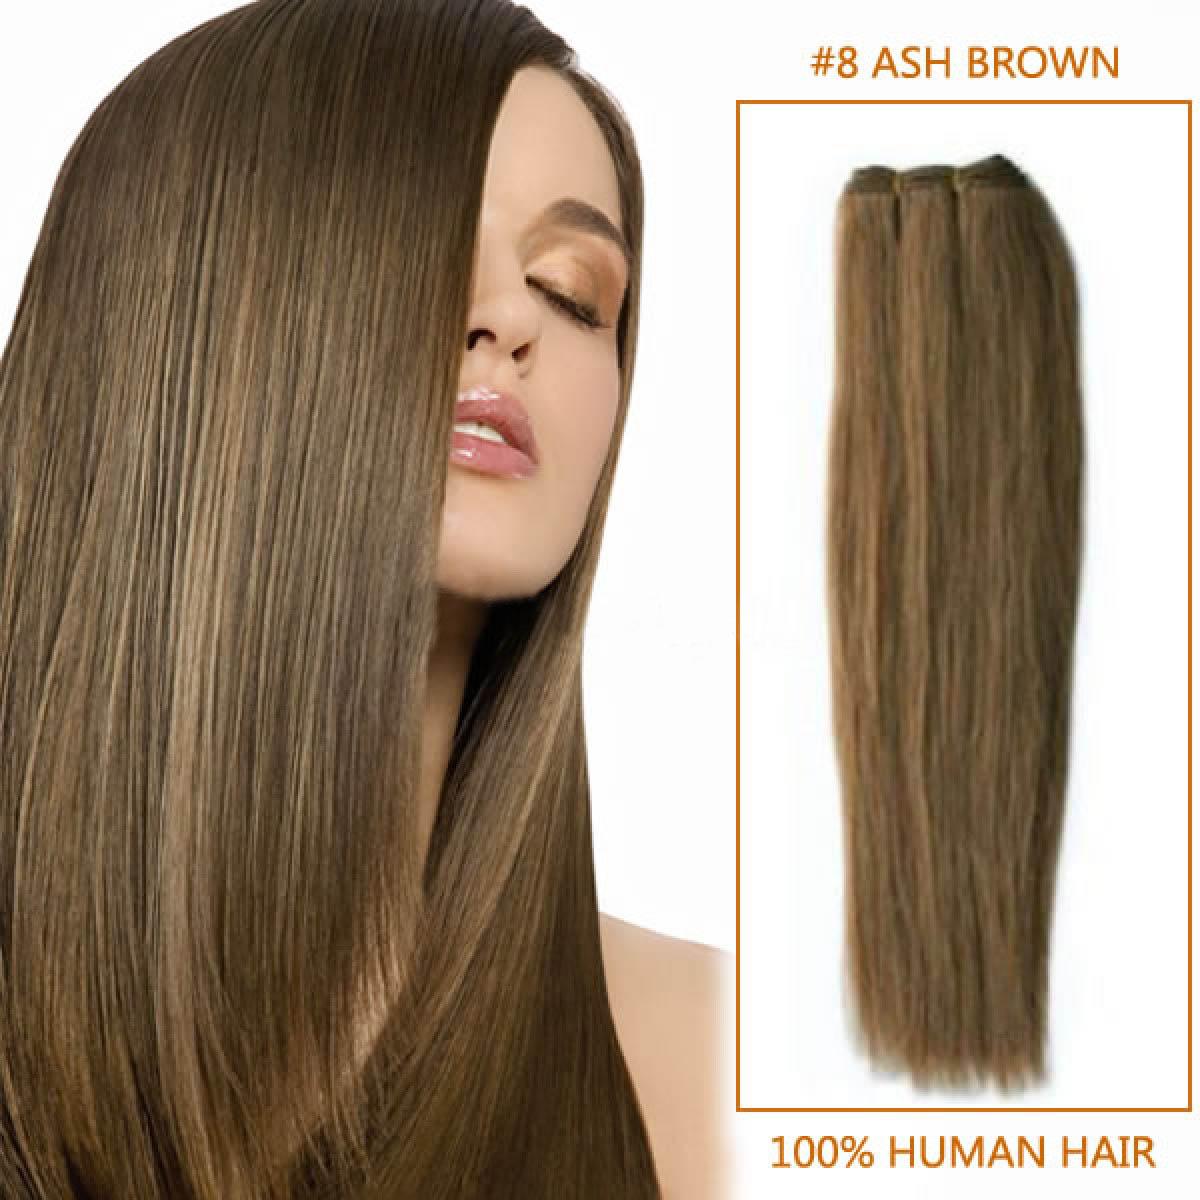 26 Inch 8 Ash Brown Straight Brazilian Virgin Hair Wefts